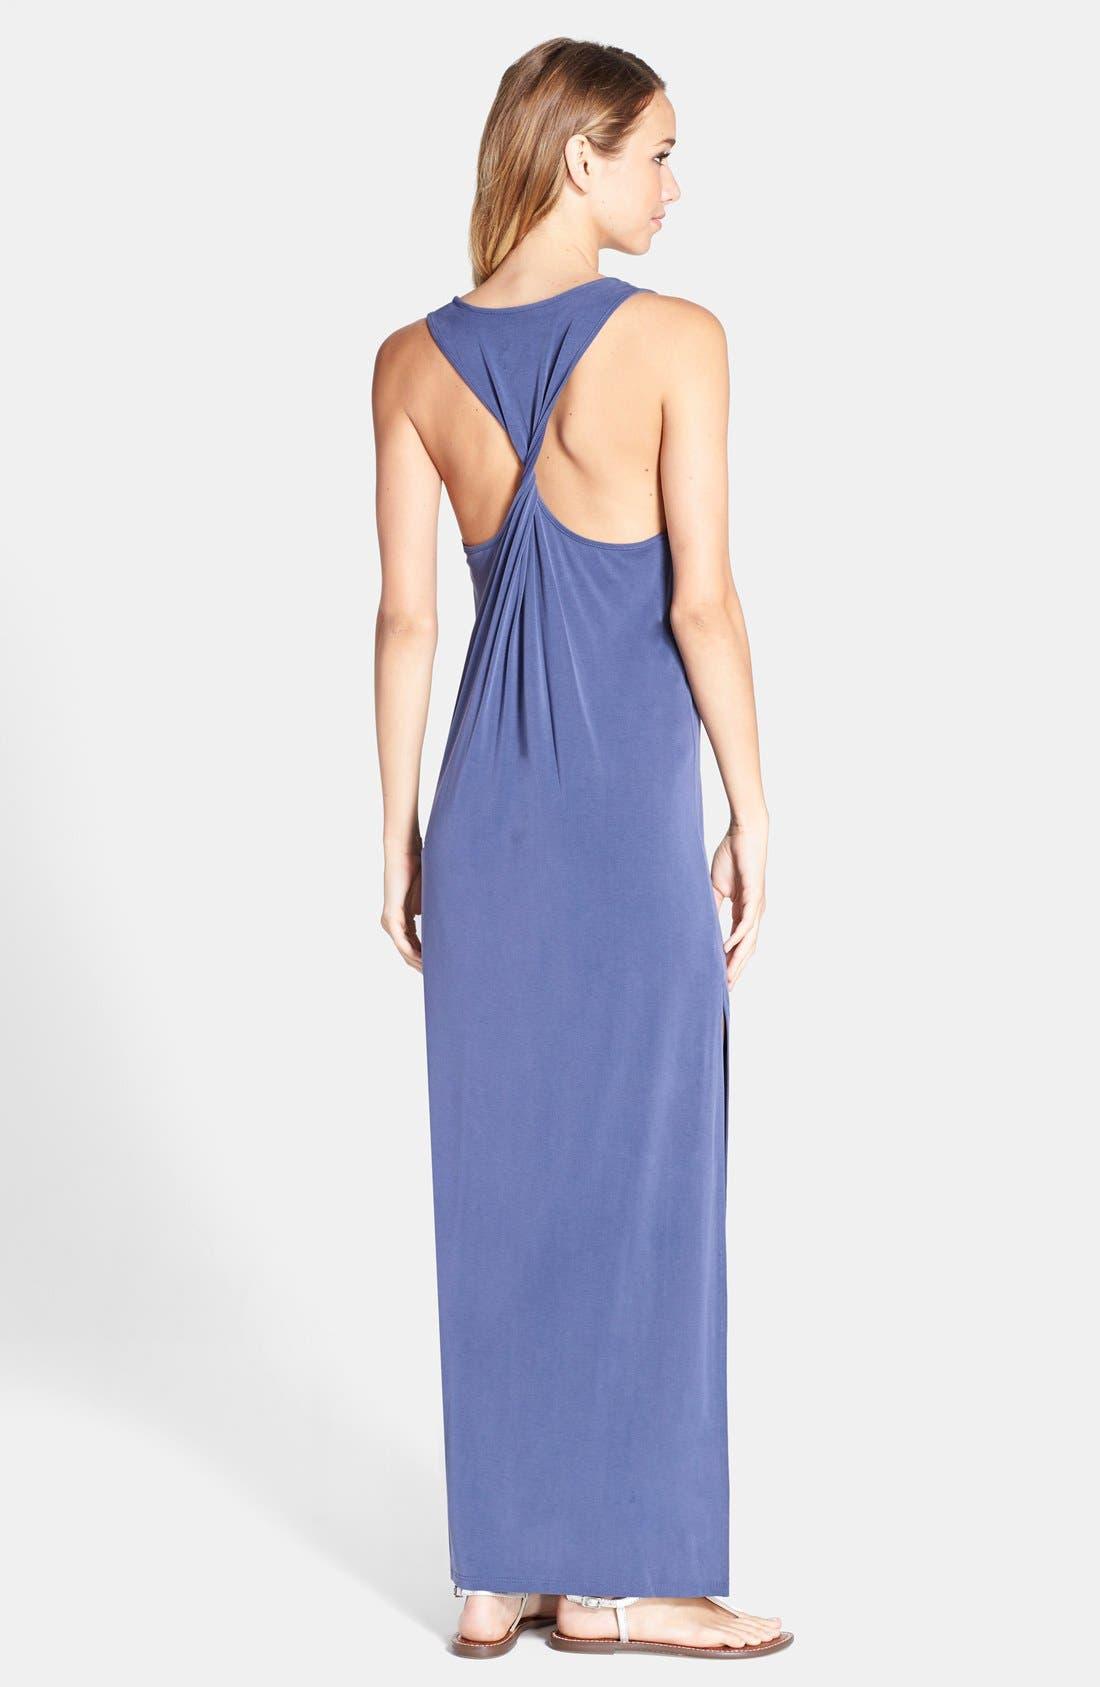 BCBGMAXAZRIA,                             'Raeghan' Racerback Jersey Maxi Dress,                             Alternate thumbnail 3, color,                             412